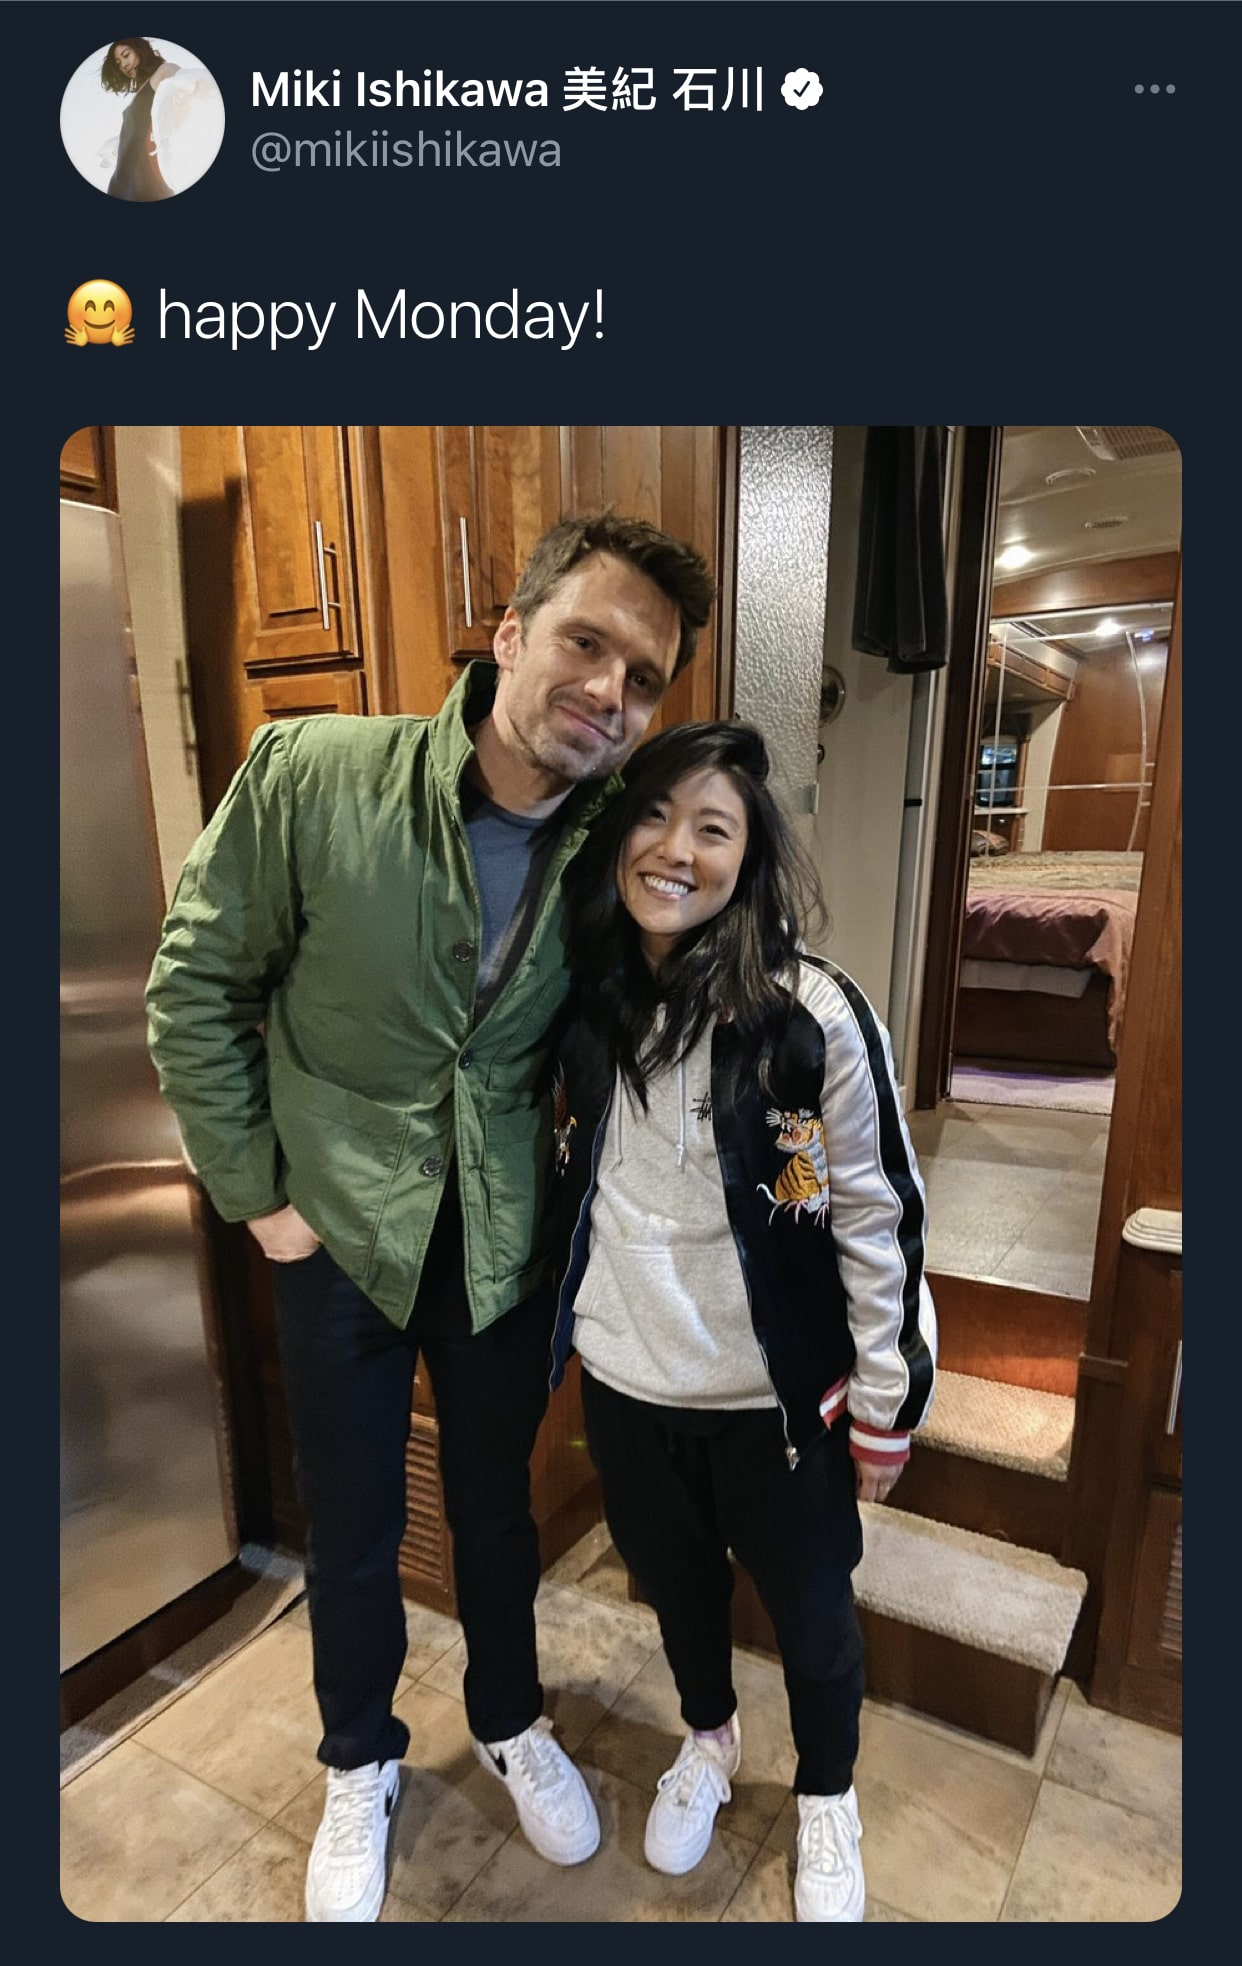 Miki Ishikawa with The Falcon and the Winter Soldier Co-star Sebastian Stan from Ishikawa's Twitter